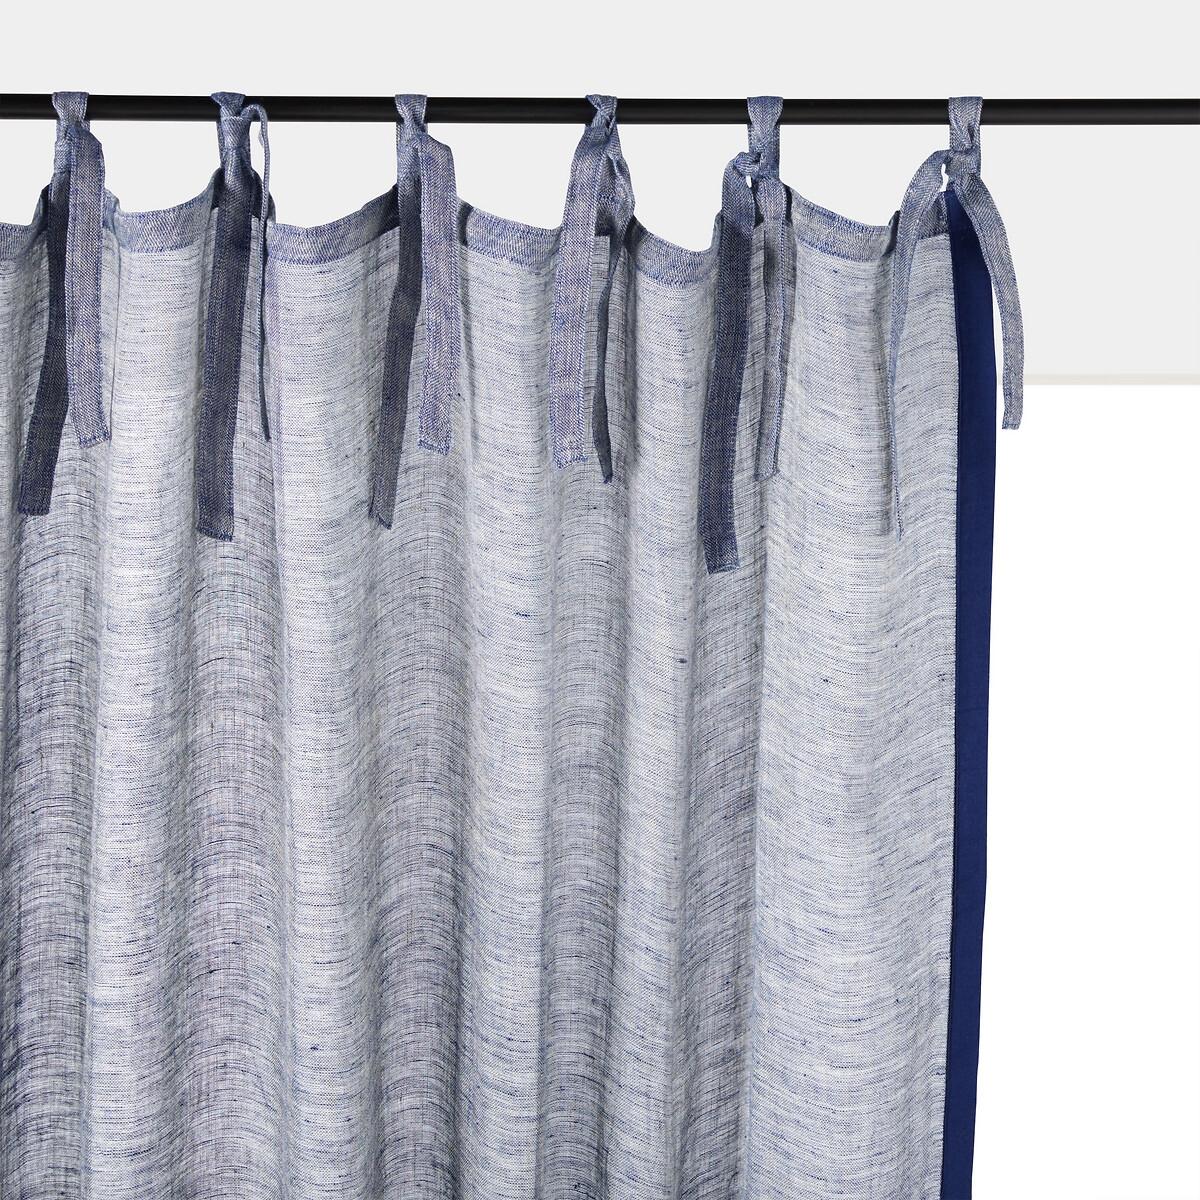 Занавеска LaRedoute Из льна шамбре Sivy 140 x 320 см бежевый занавеска la redoute лнбархат aasta 140 x 350 см синий